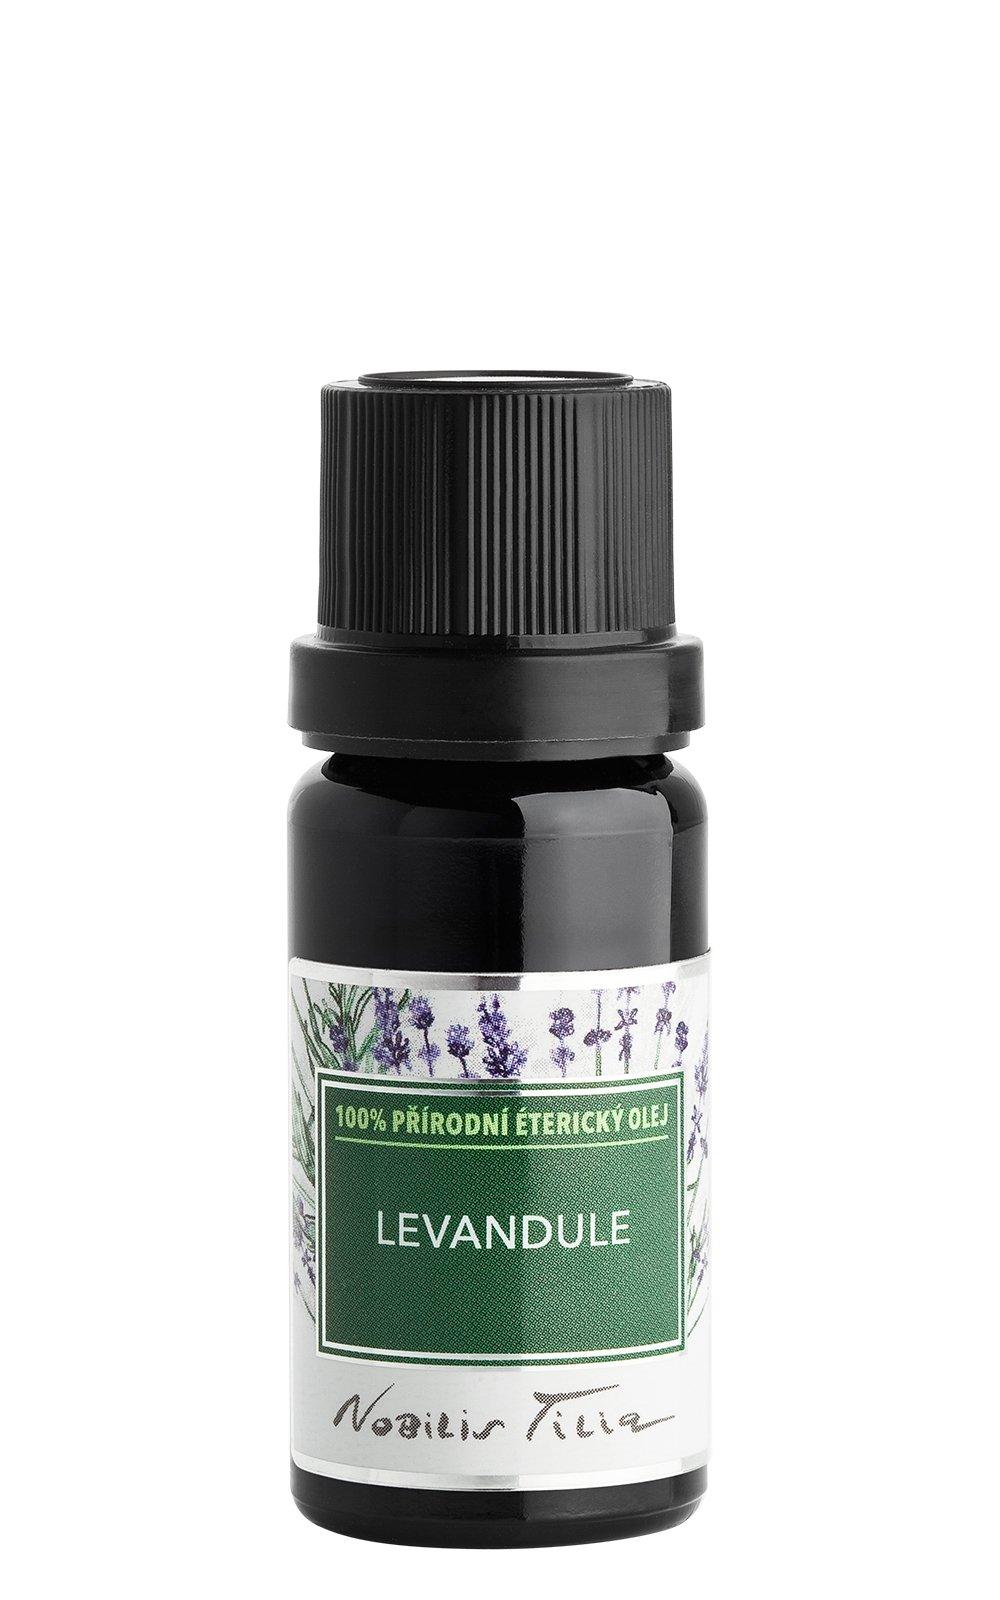 Éterický olej Levandule: 5 ml